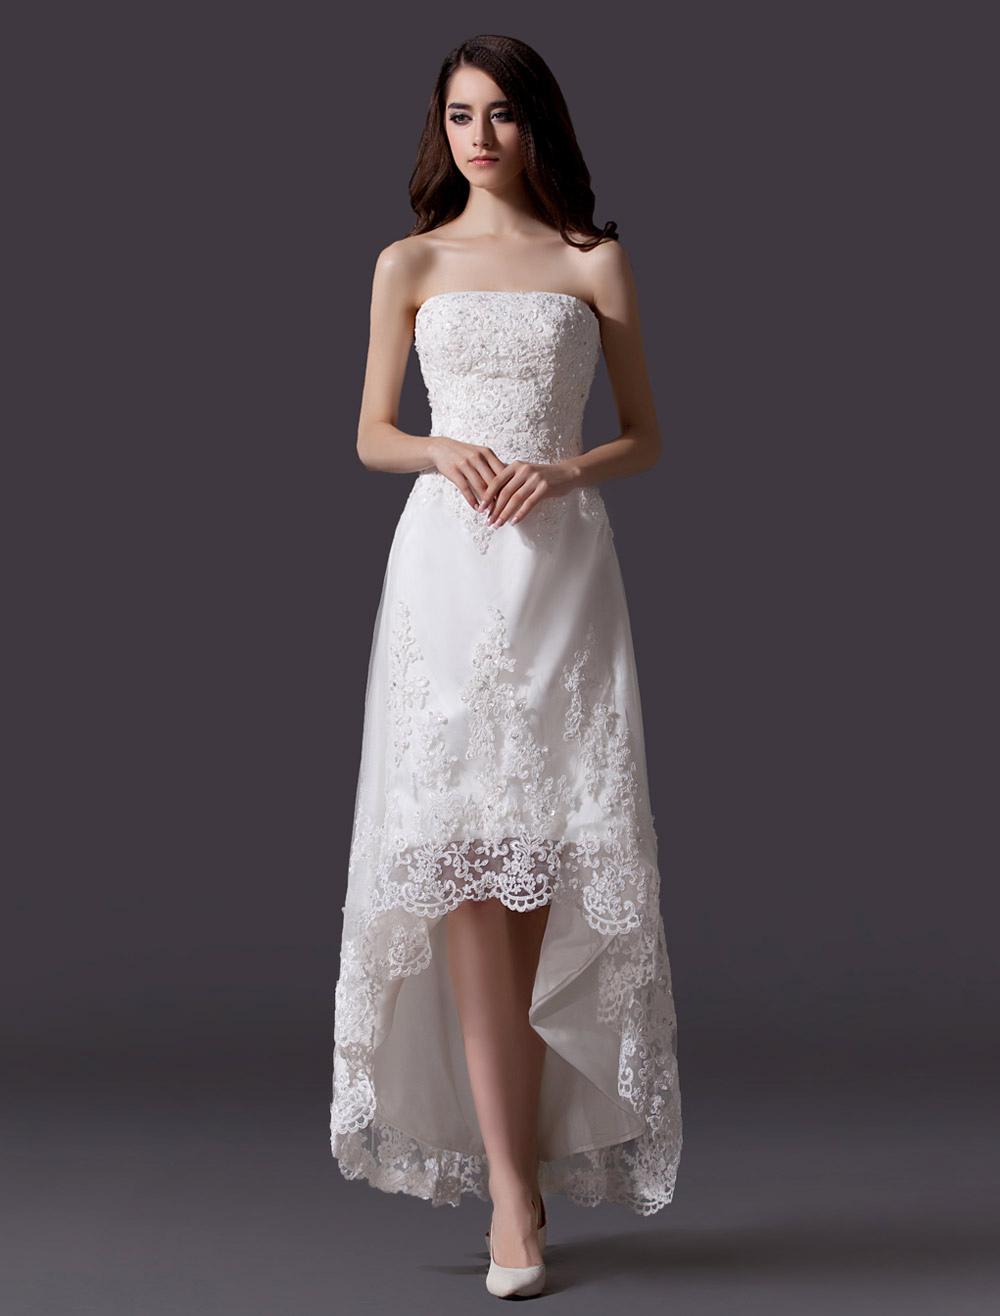 Strapless Hi-Lo Lace Wedding Dress